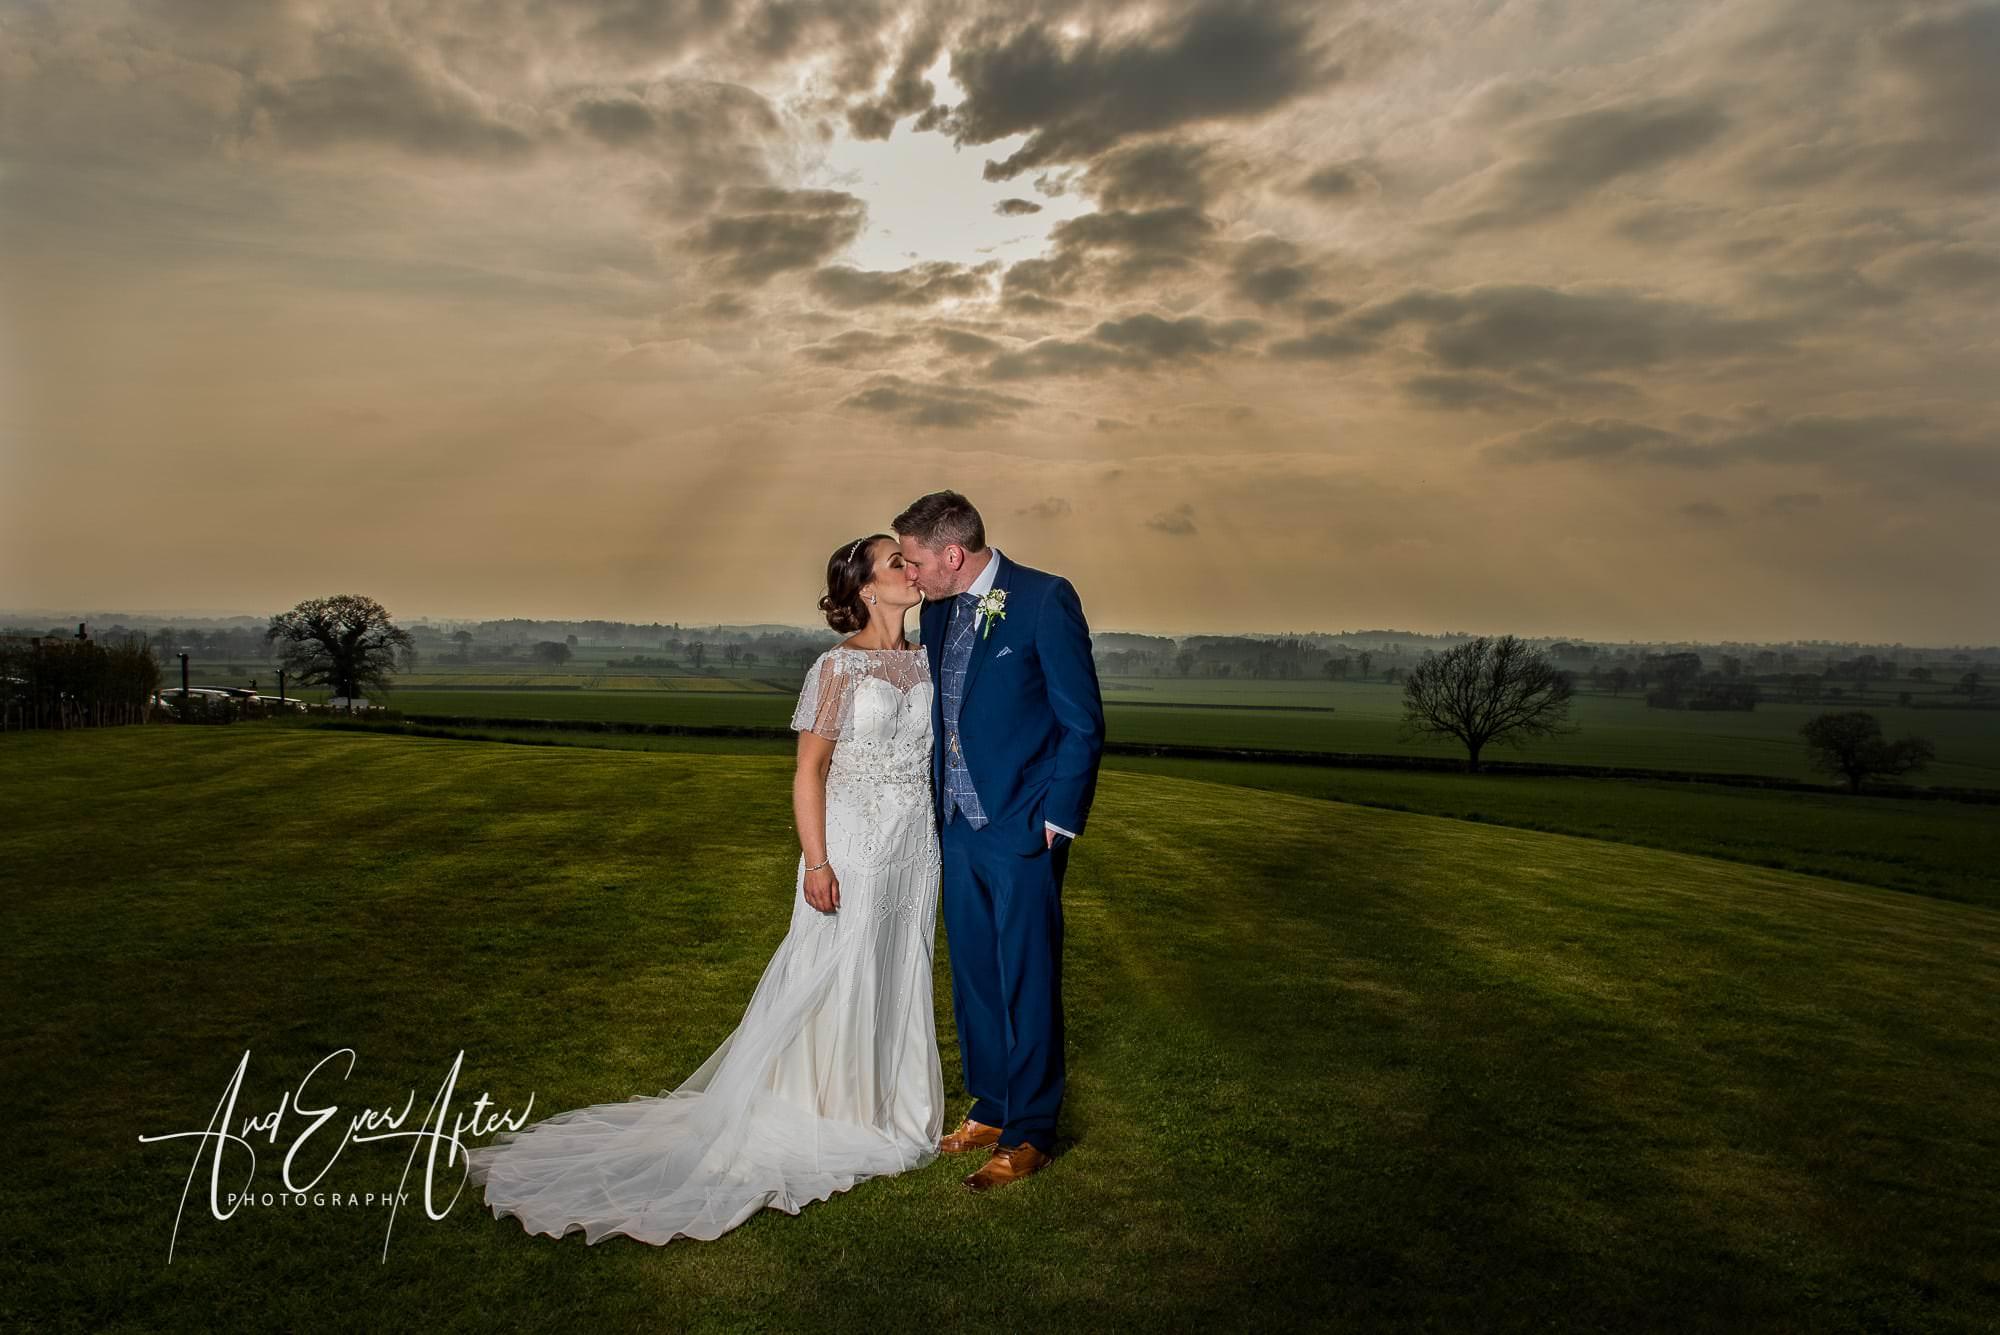 bride, groom, wedding day, love, sunset,